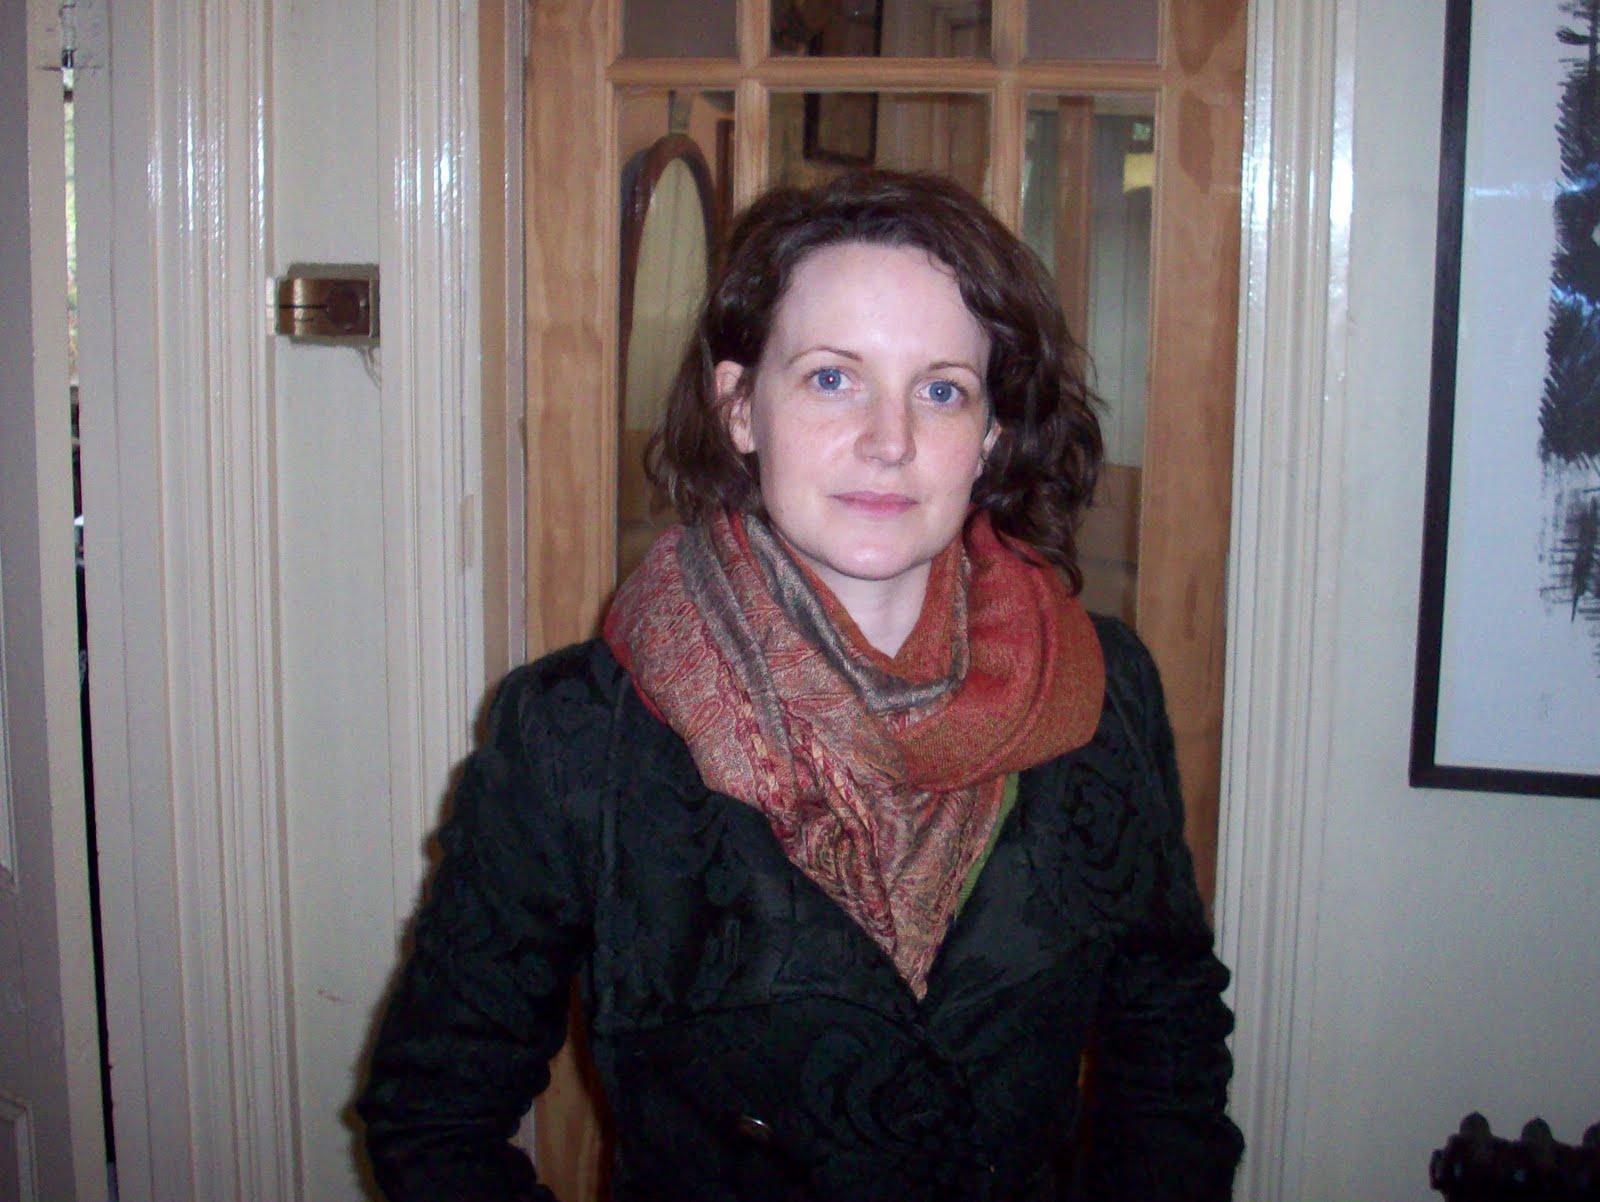 emma cleasby - JungleKey.co.uk Image #50